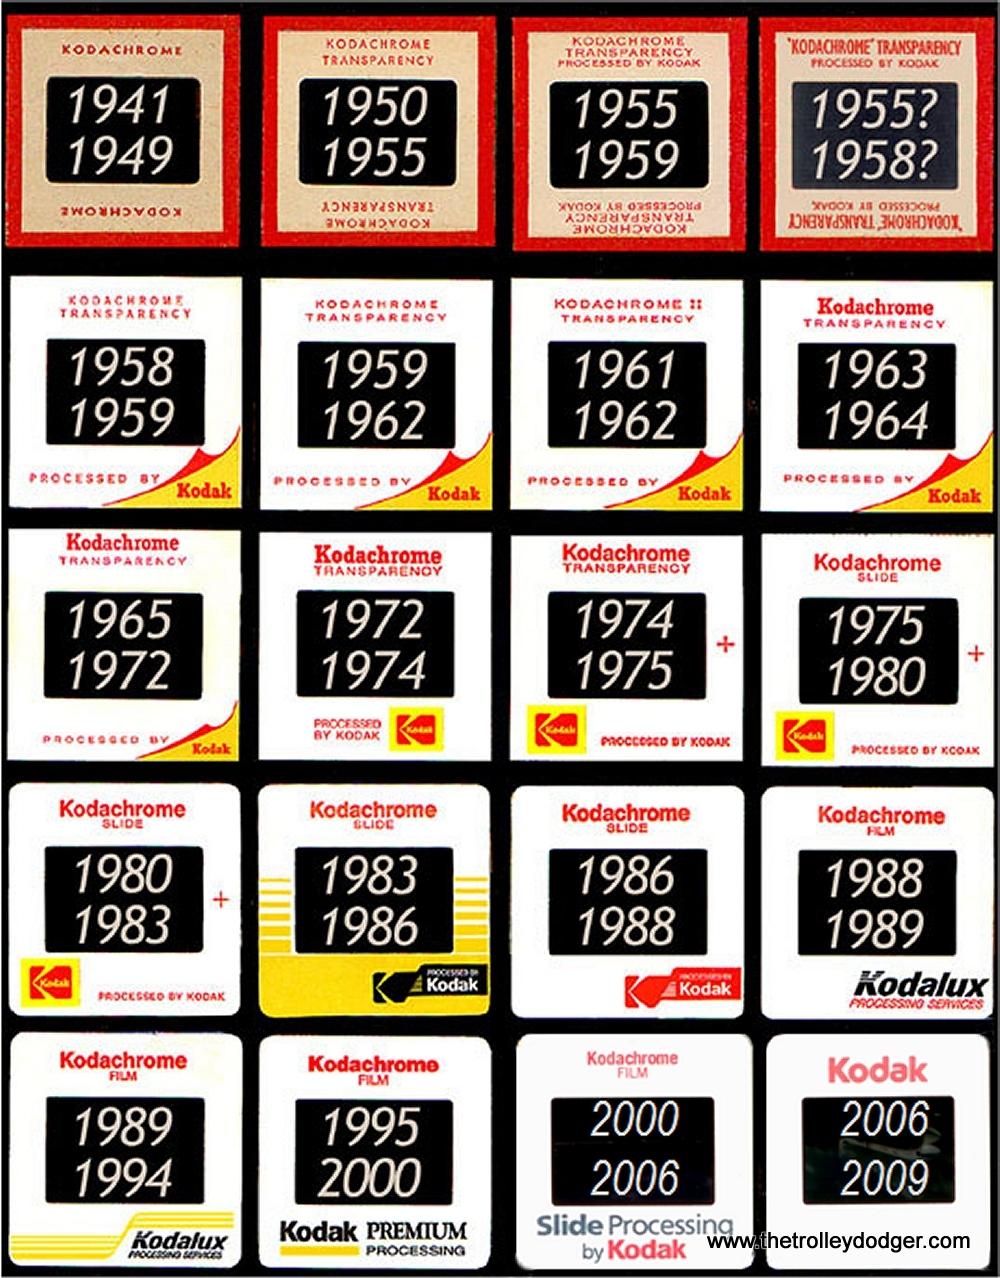 Dating Kodachrome bilder